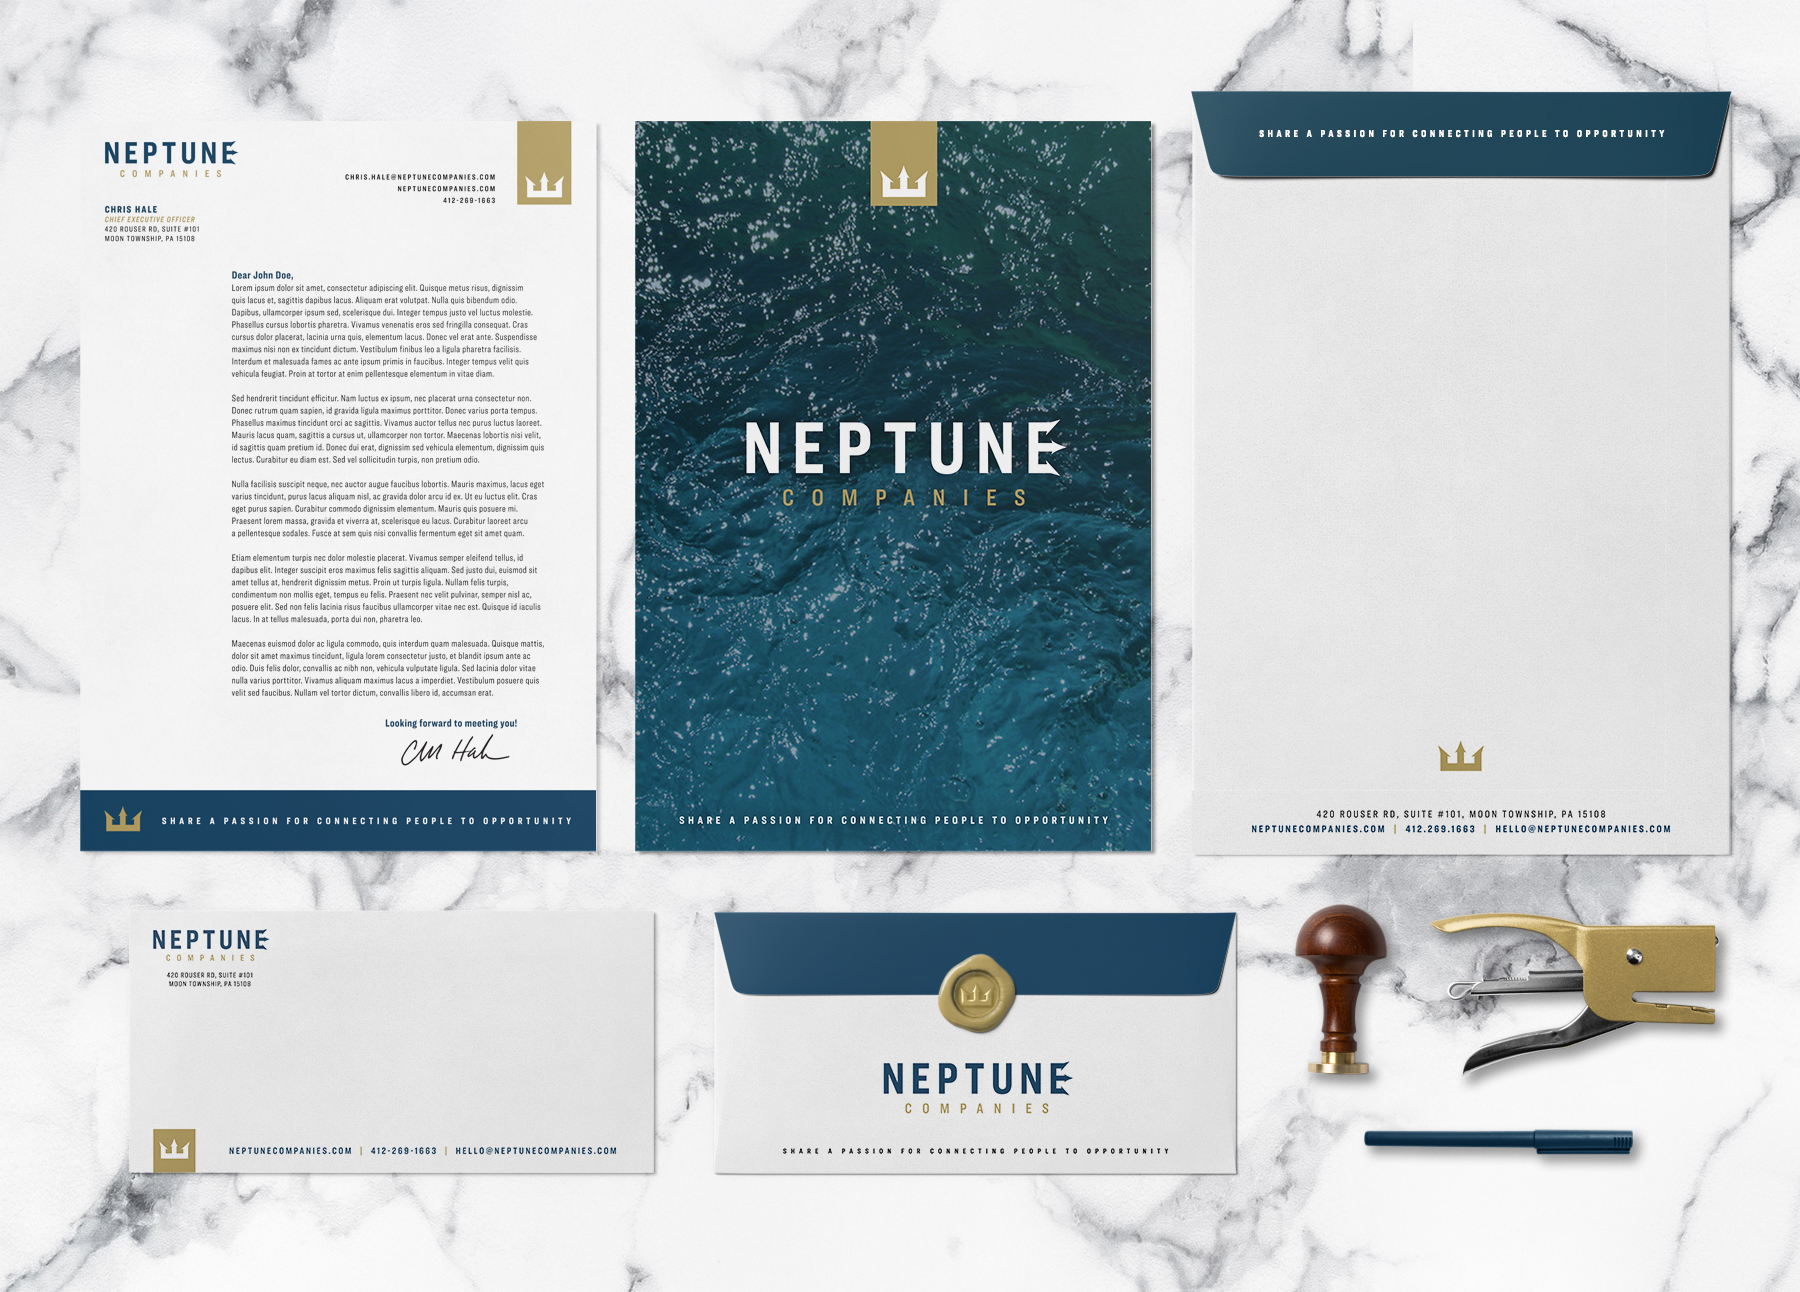 Neptune Companies' Stationary